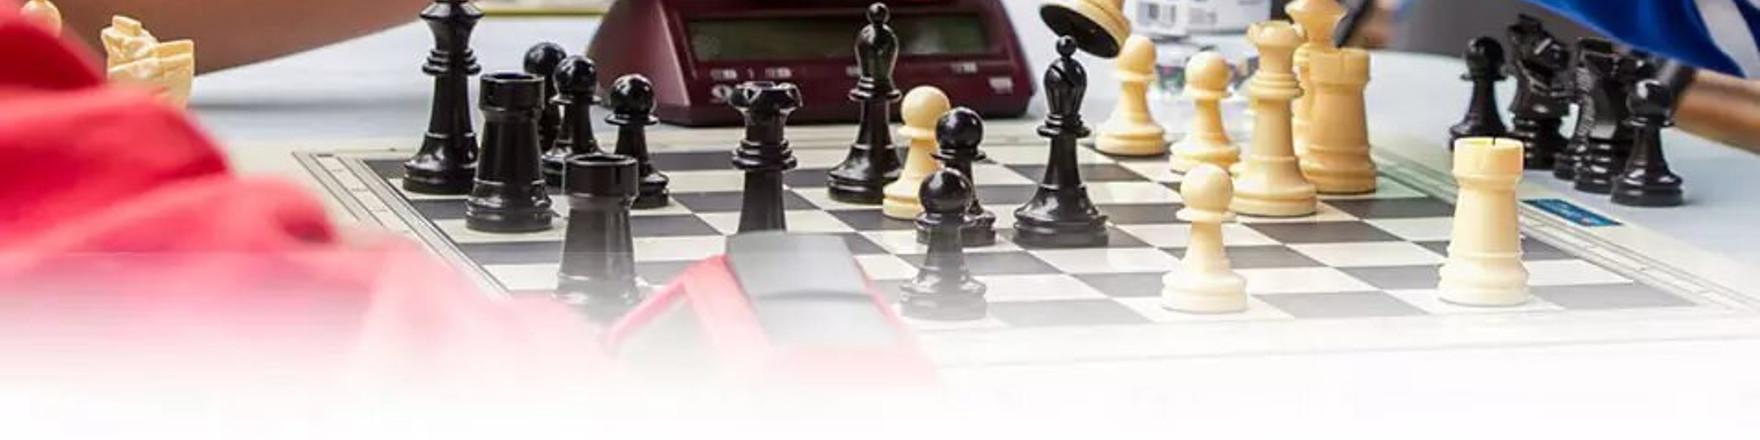 ajedrez bg seccion 01